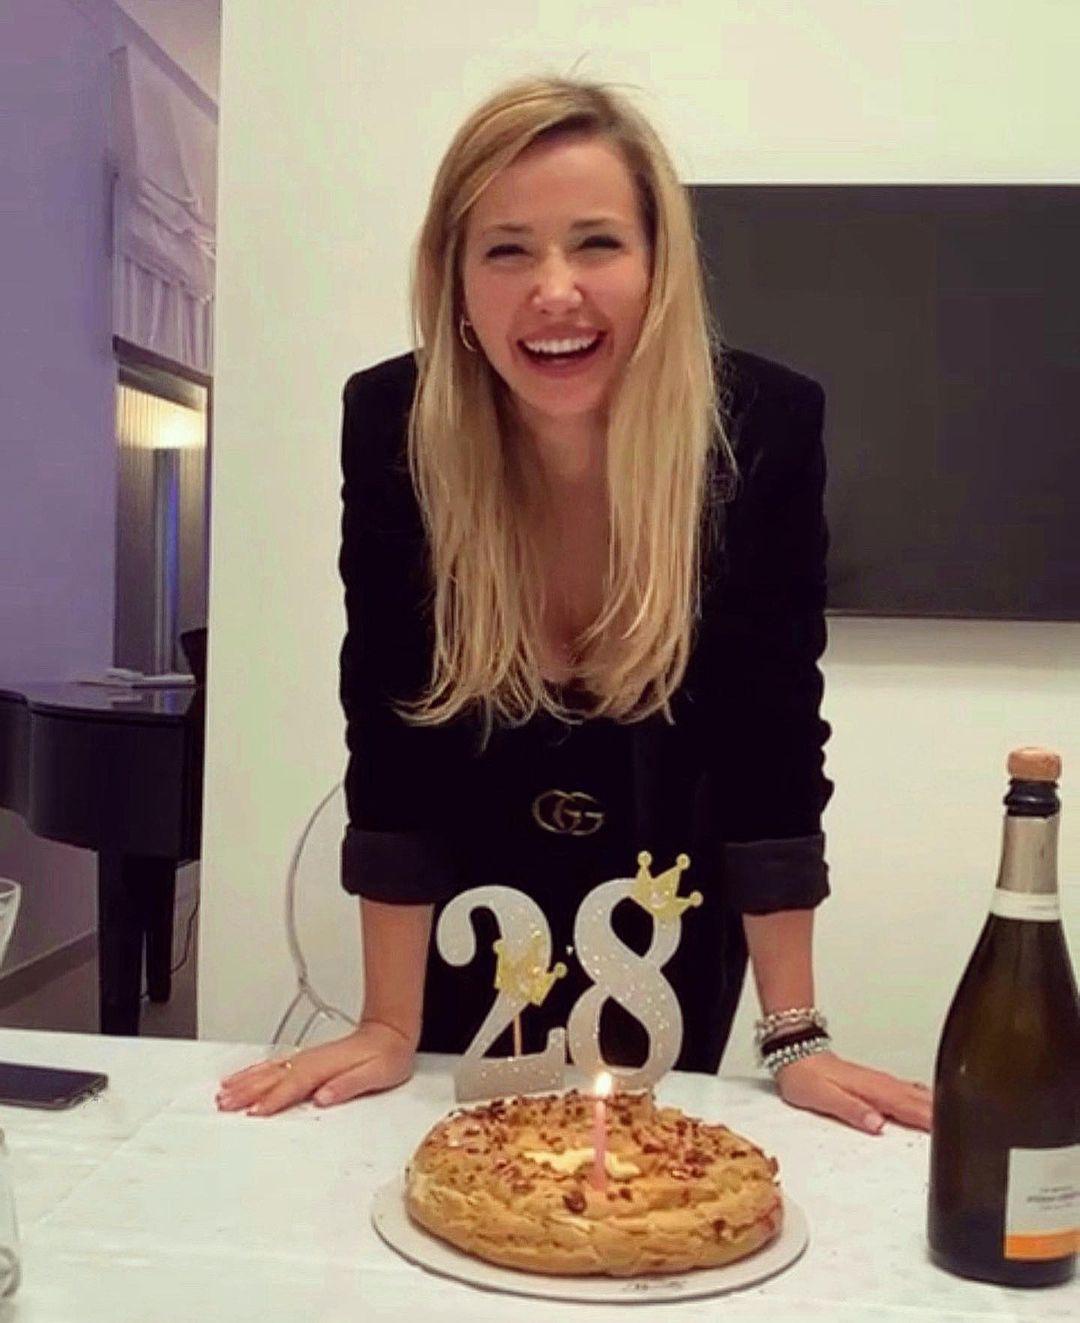 Denise Esposito festeggia 28 anni